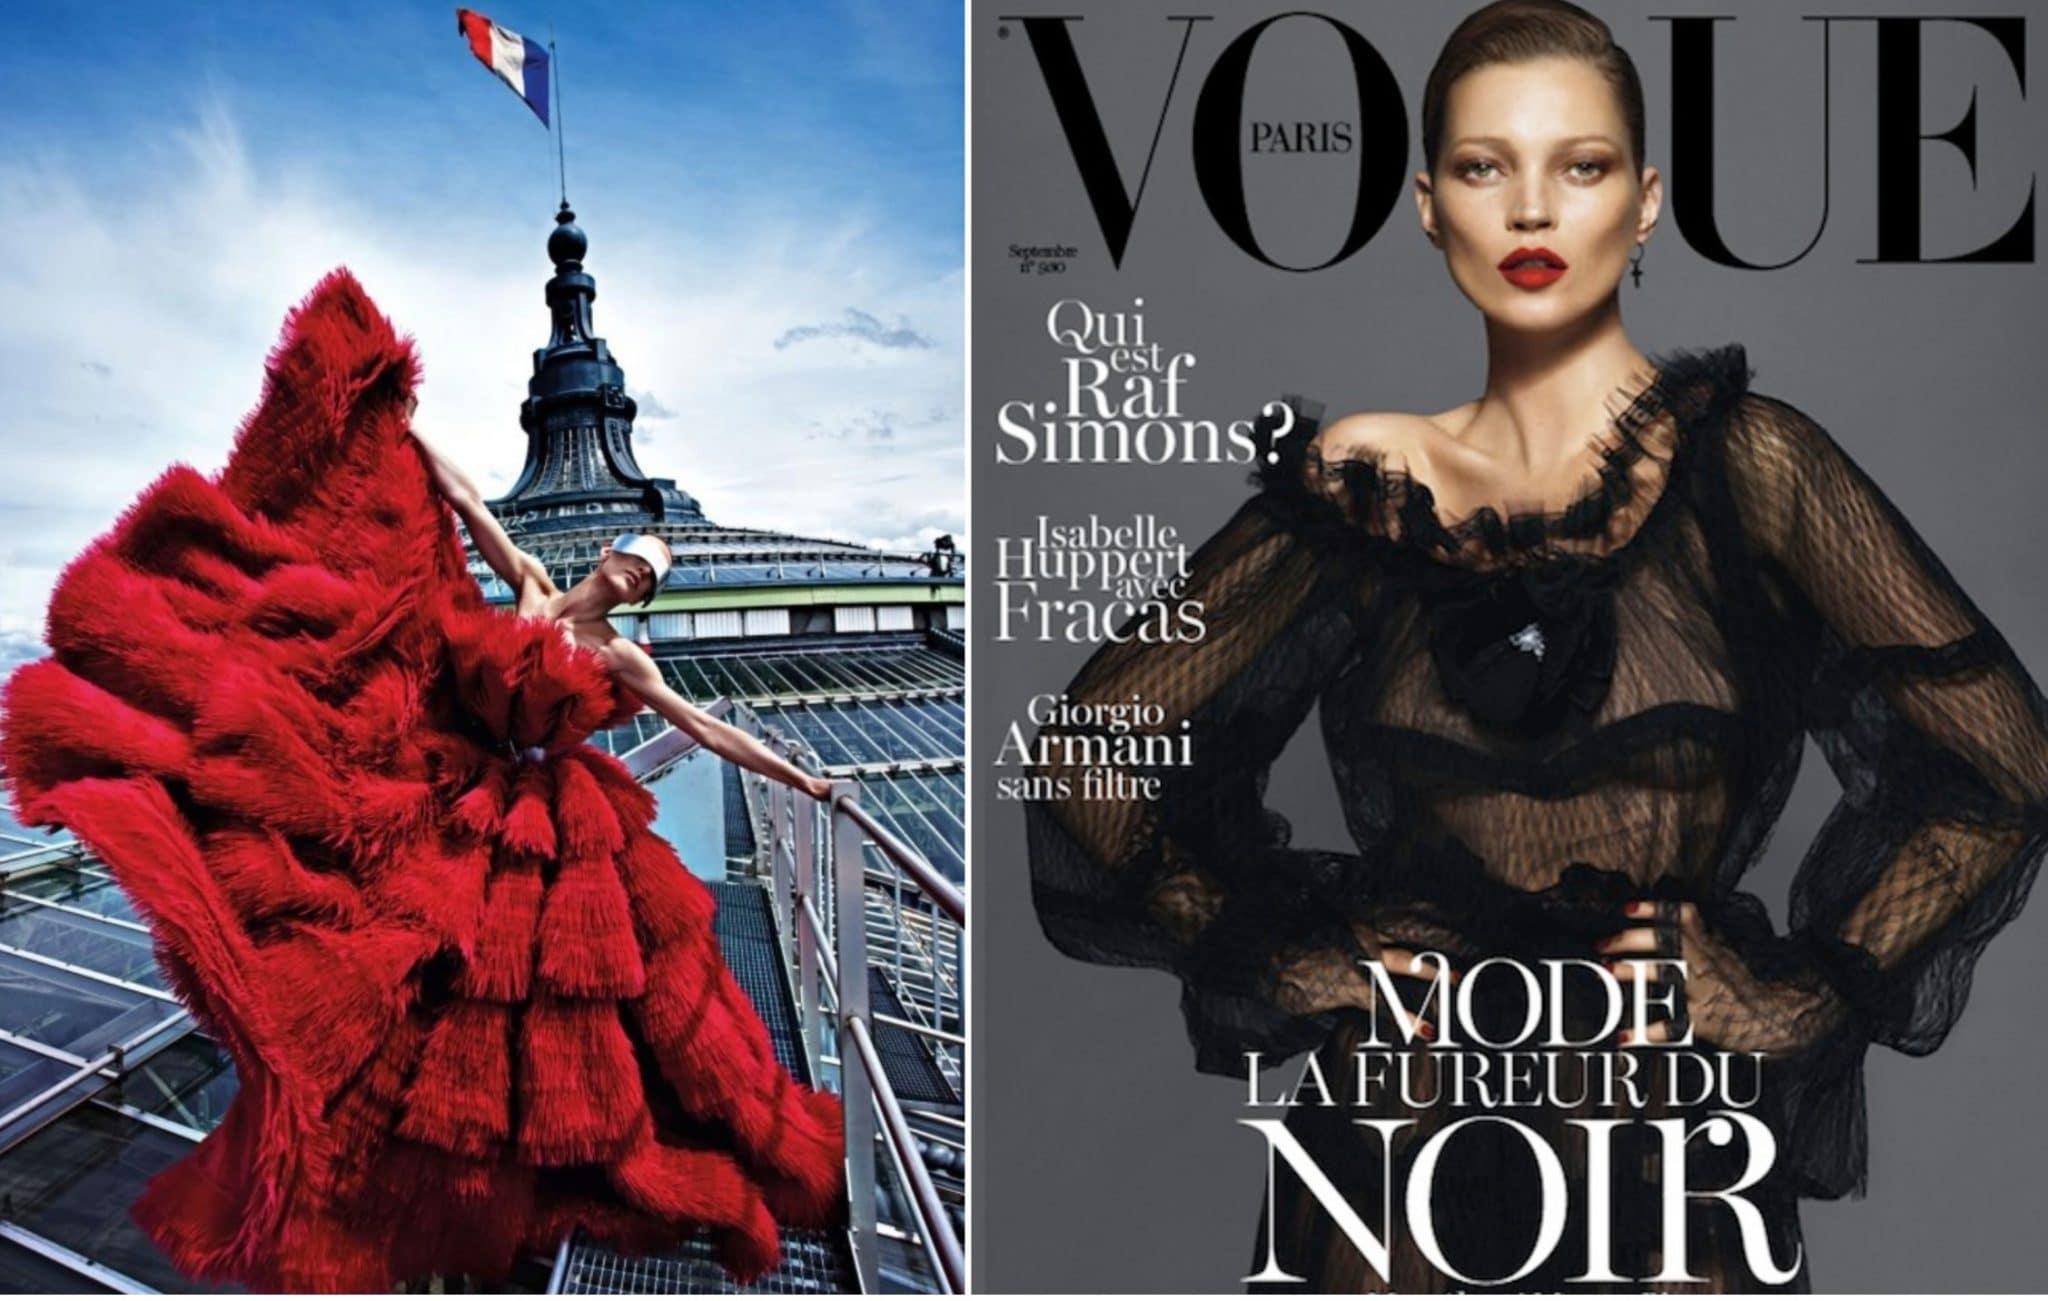 100 ans magazine Vogue Paris Palais Galliera